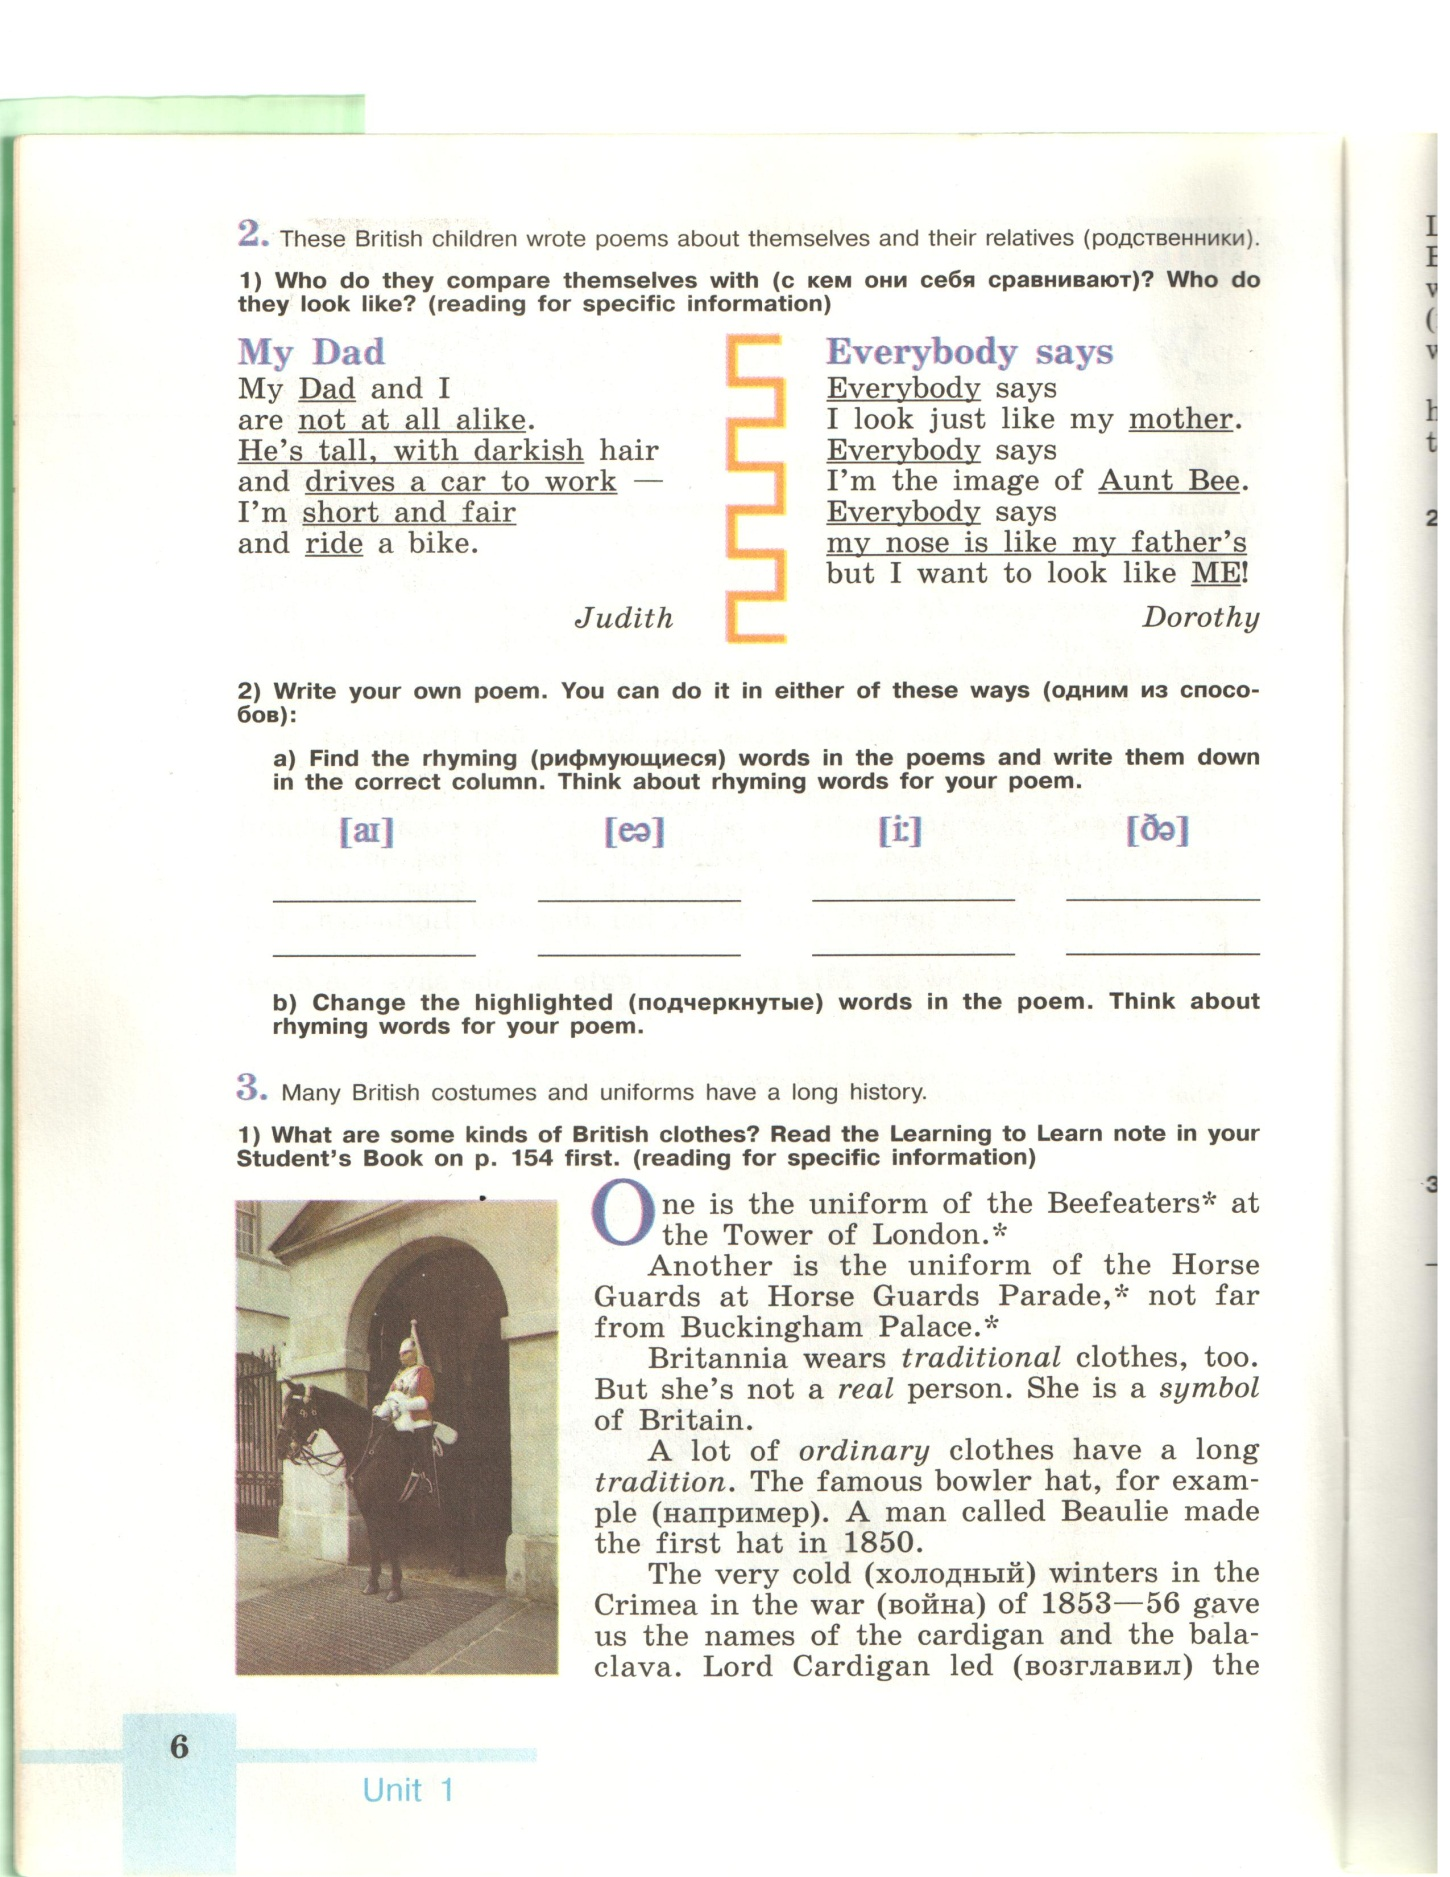 C:\Users\Грузиновская СОШ\Documents\Scanned Documents\Рисунок (2057).jpg